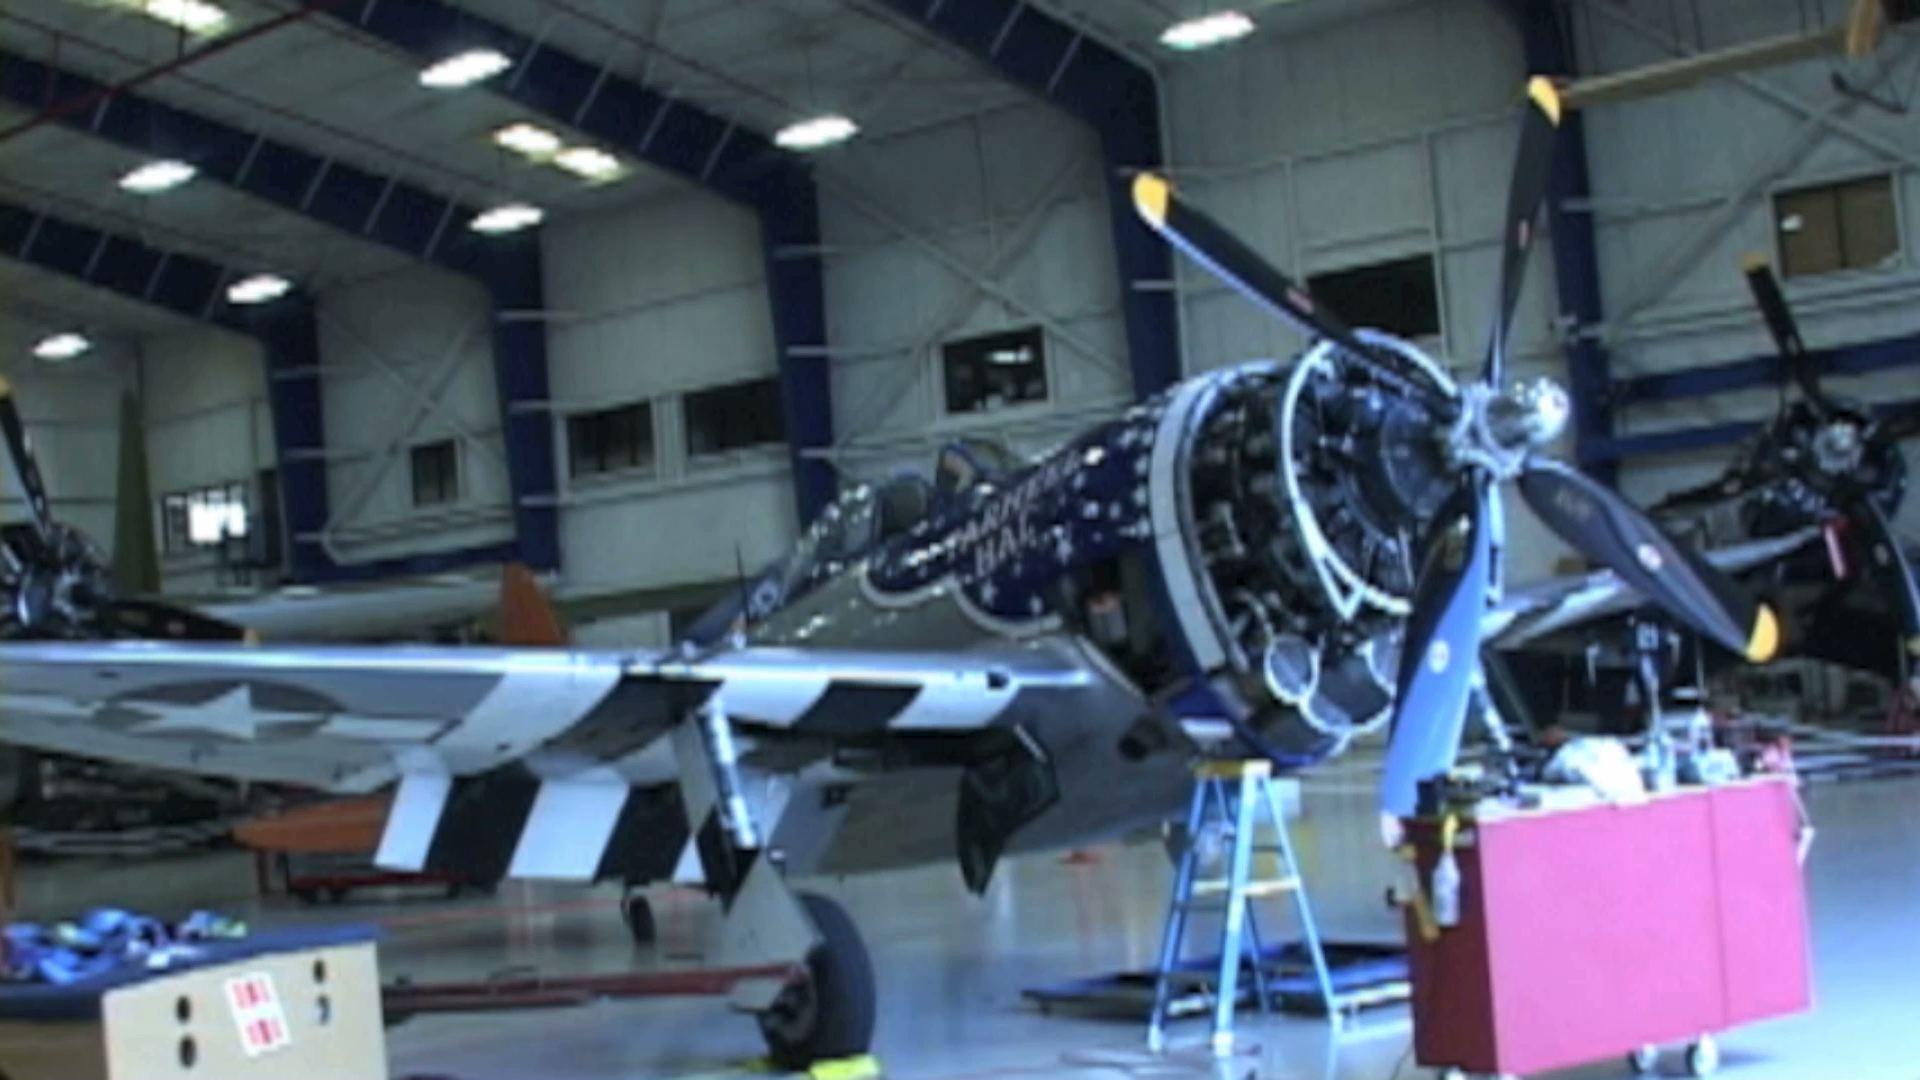 Mach 25 Speed In Mph Flight Museum